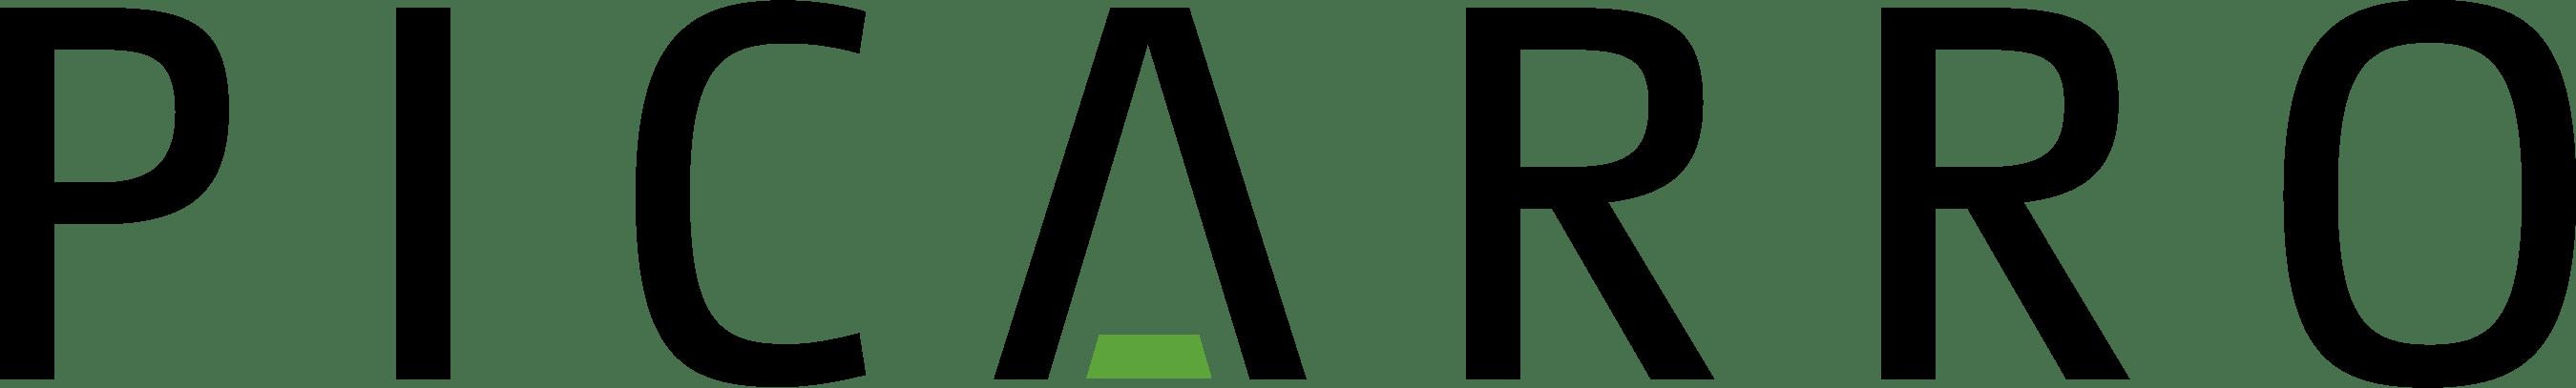 Picarro Logo